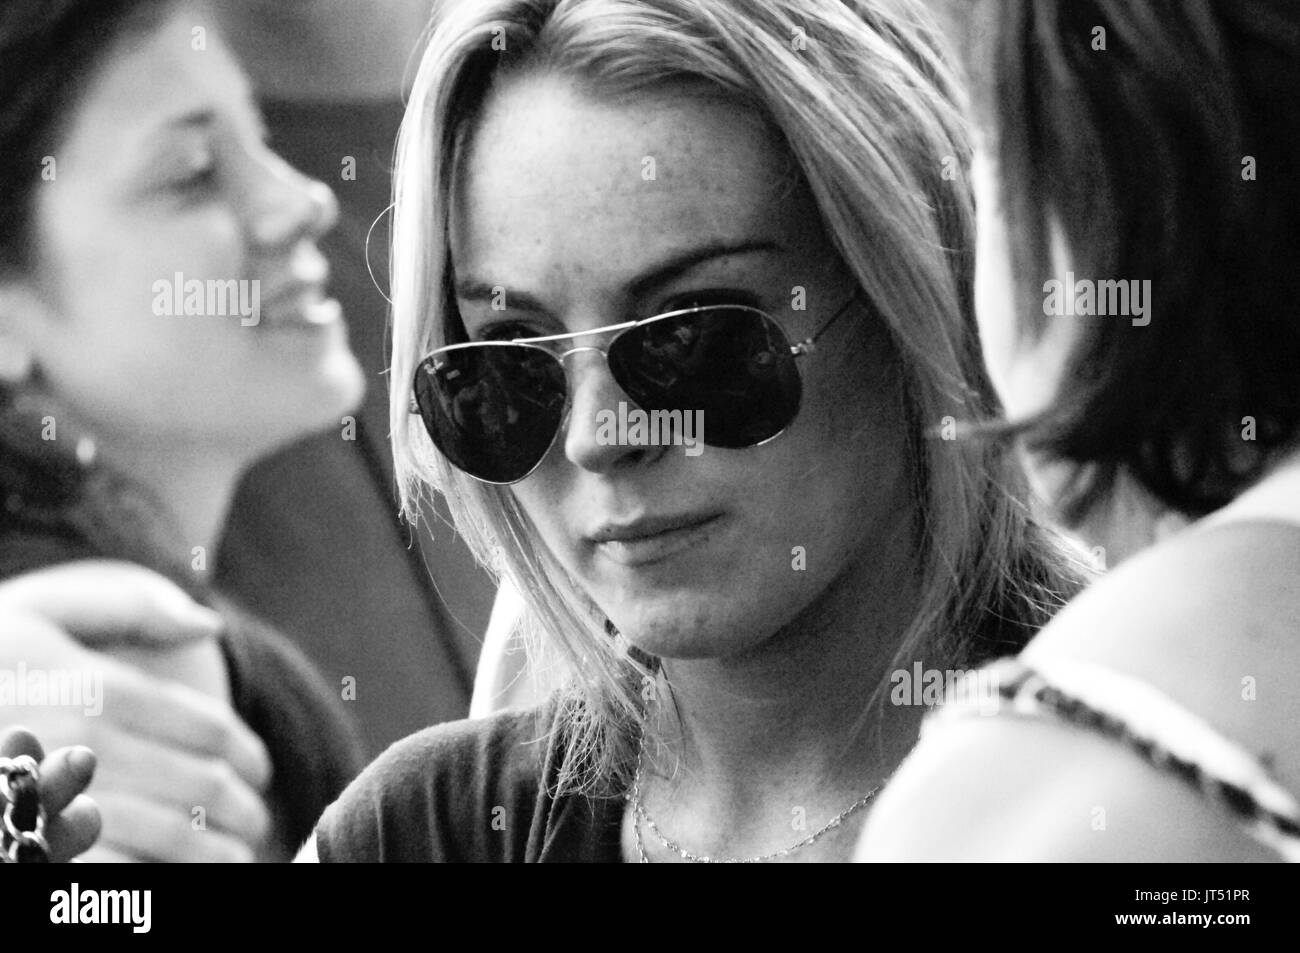 Lindsay Lohan 2008 Lollapalooza Music Festival Grant Park Chicago. - Stock Image